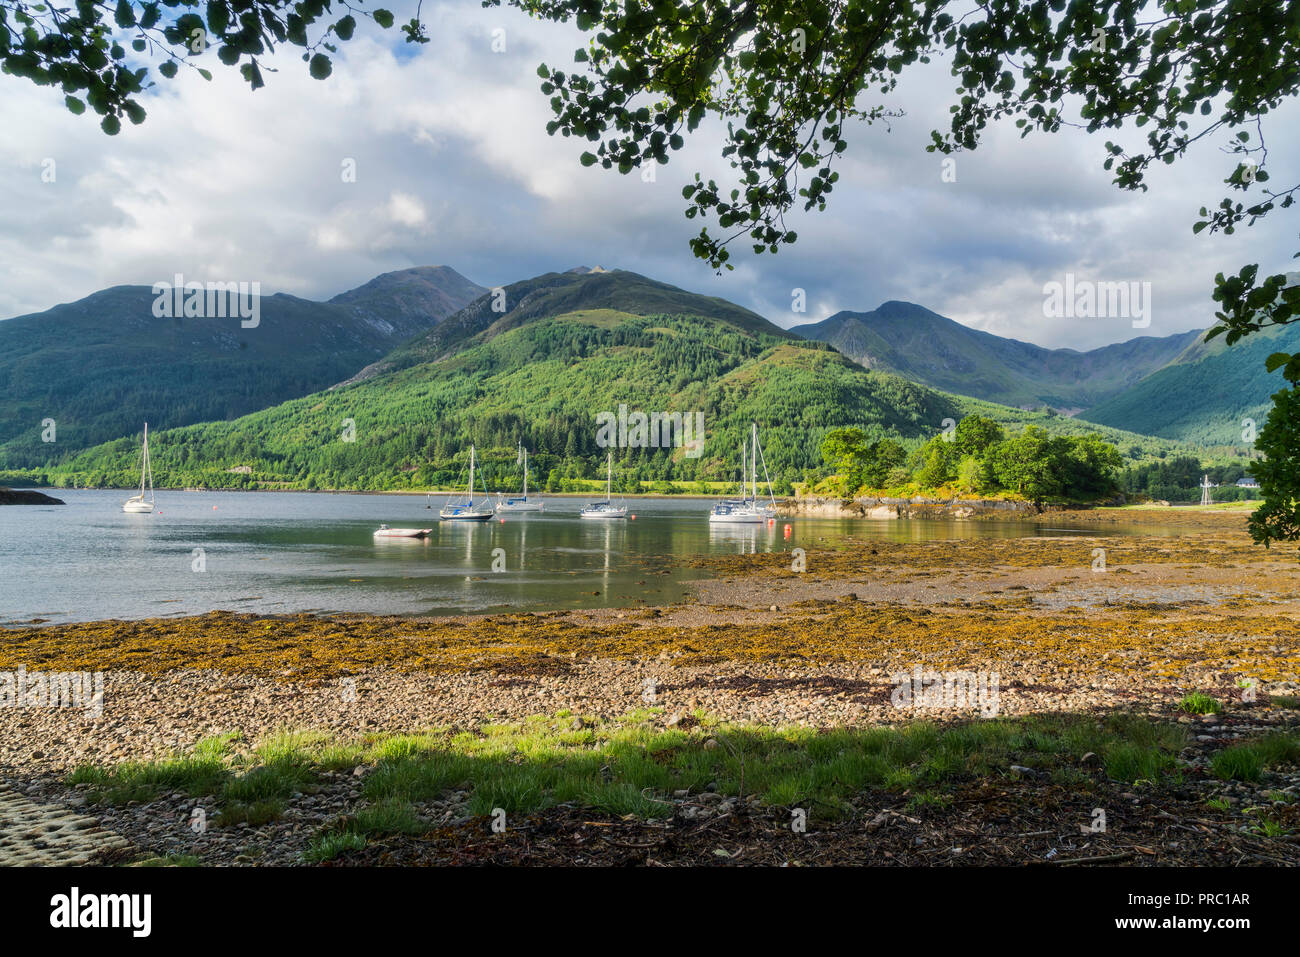 Loch Leven, Bishop's Bay, looking to Glencoe Mountains, North Ballachulish, Highland Region, Scotland UK - Stock Image